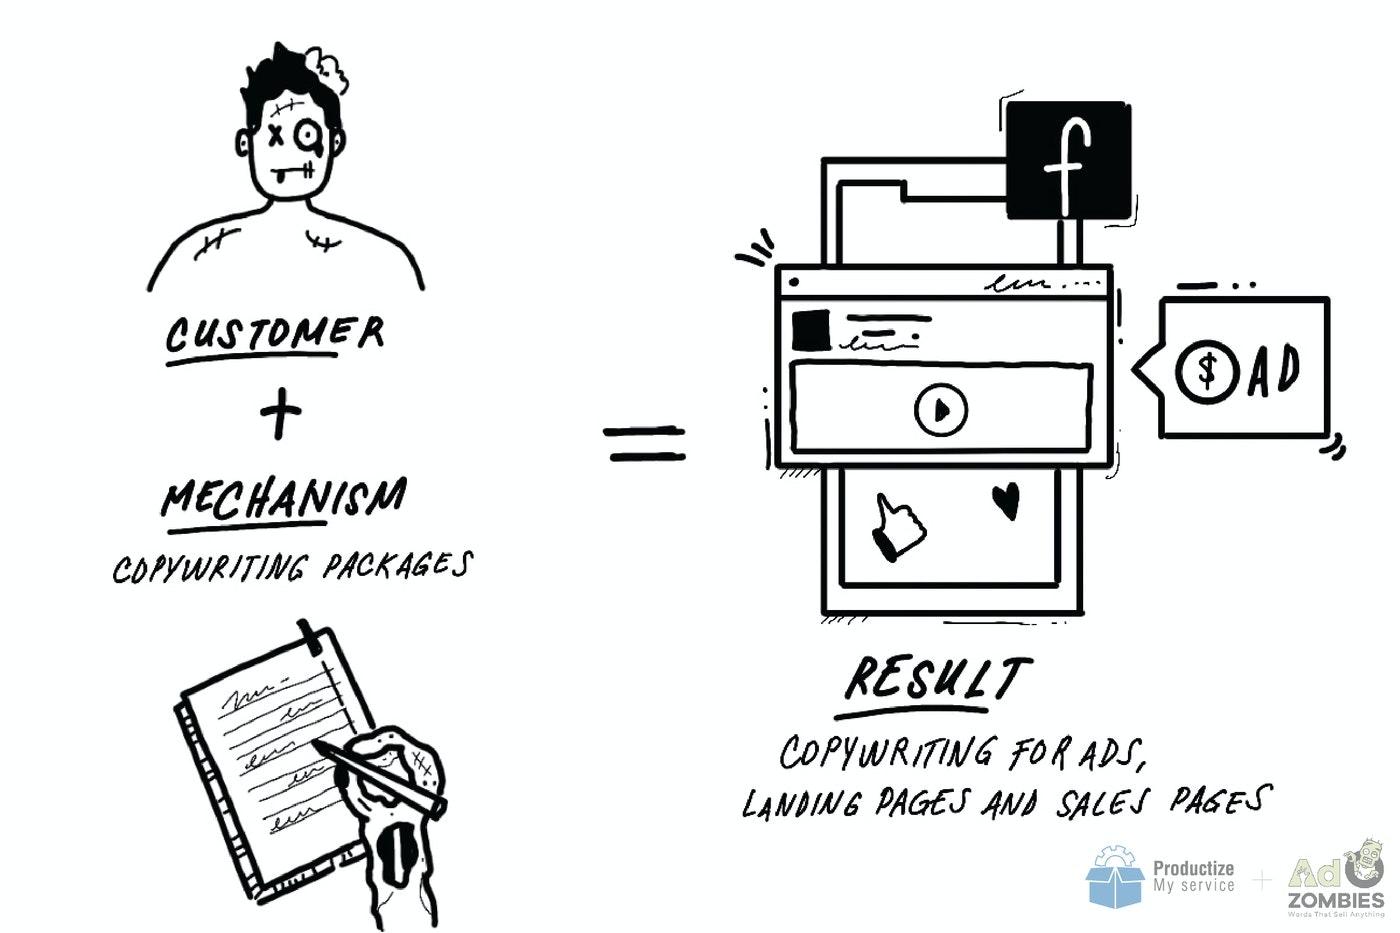 Ad Zombies Business Model.jpeg